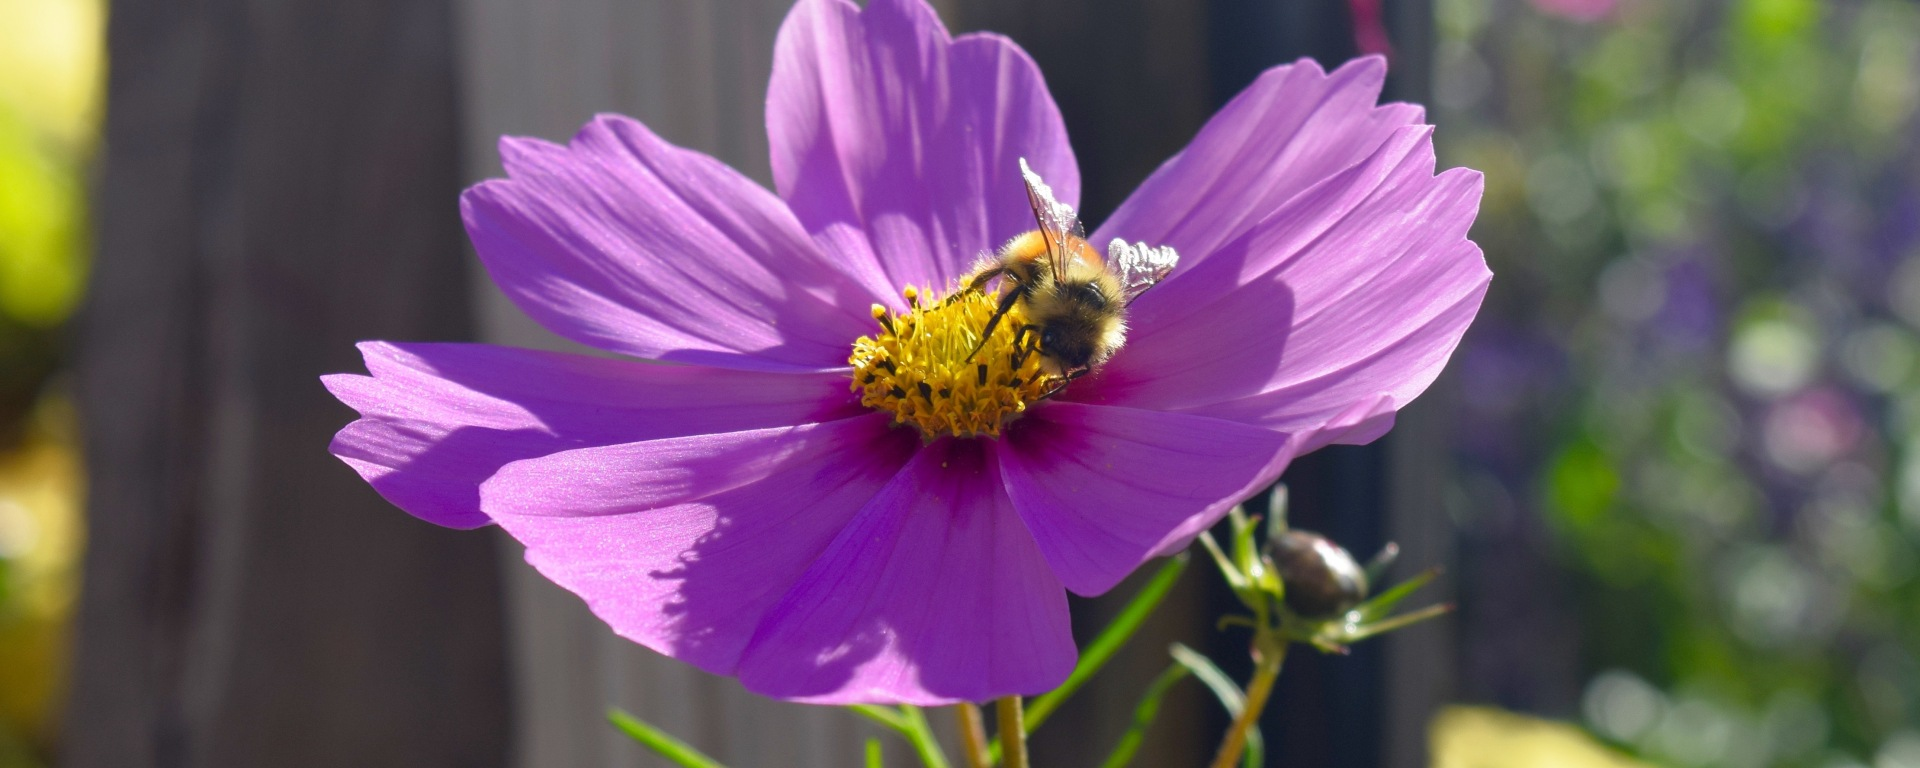 flower, bee, nature